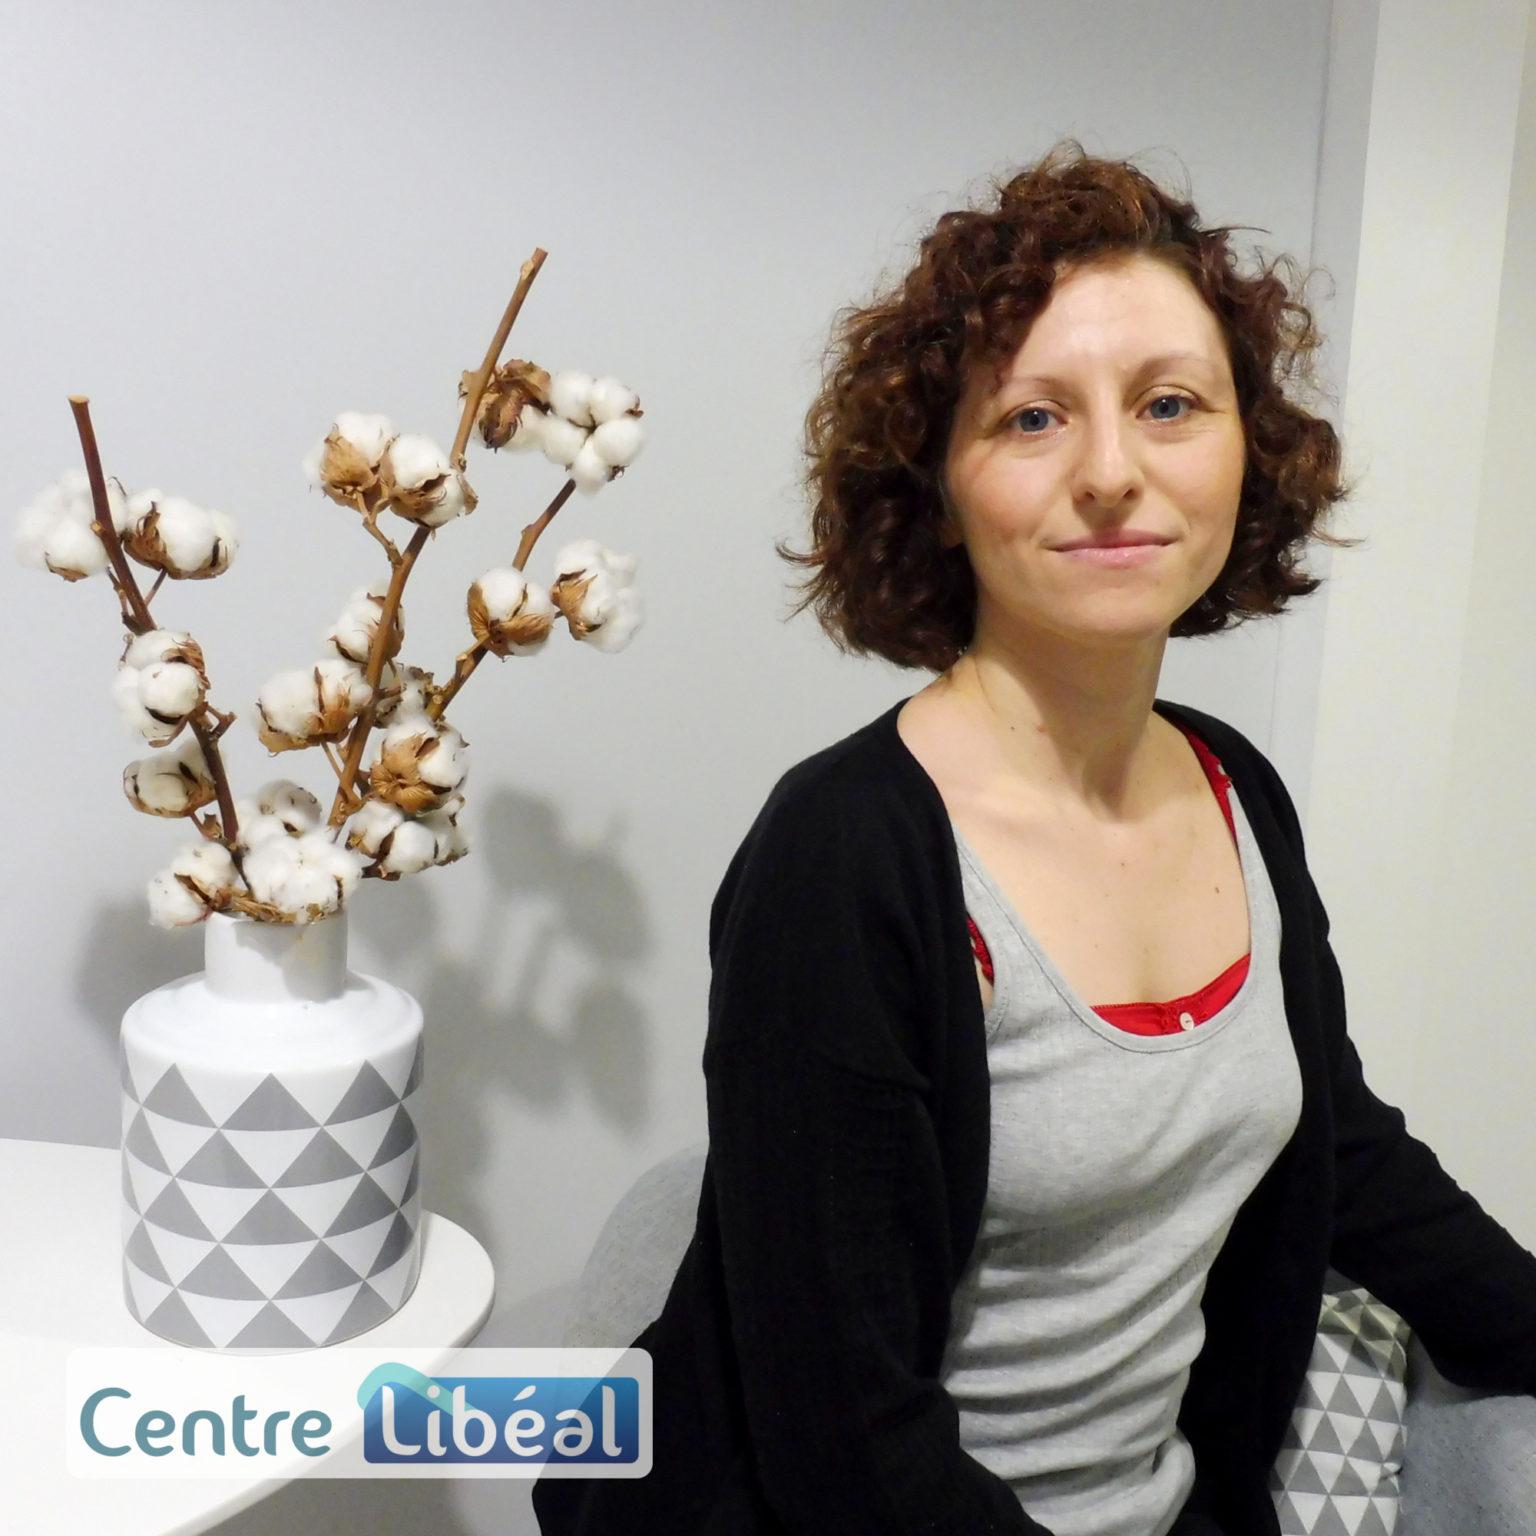 Priscillia Matias Ruminations mentales Centre Libeal